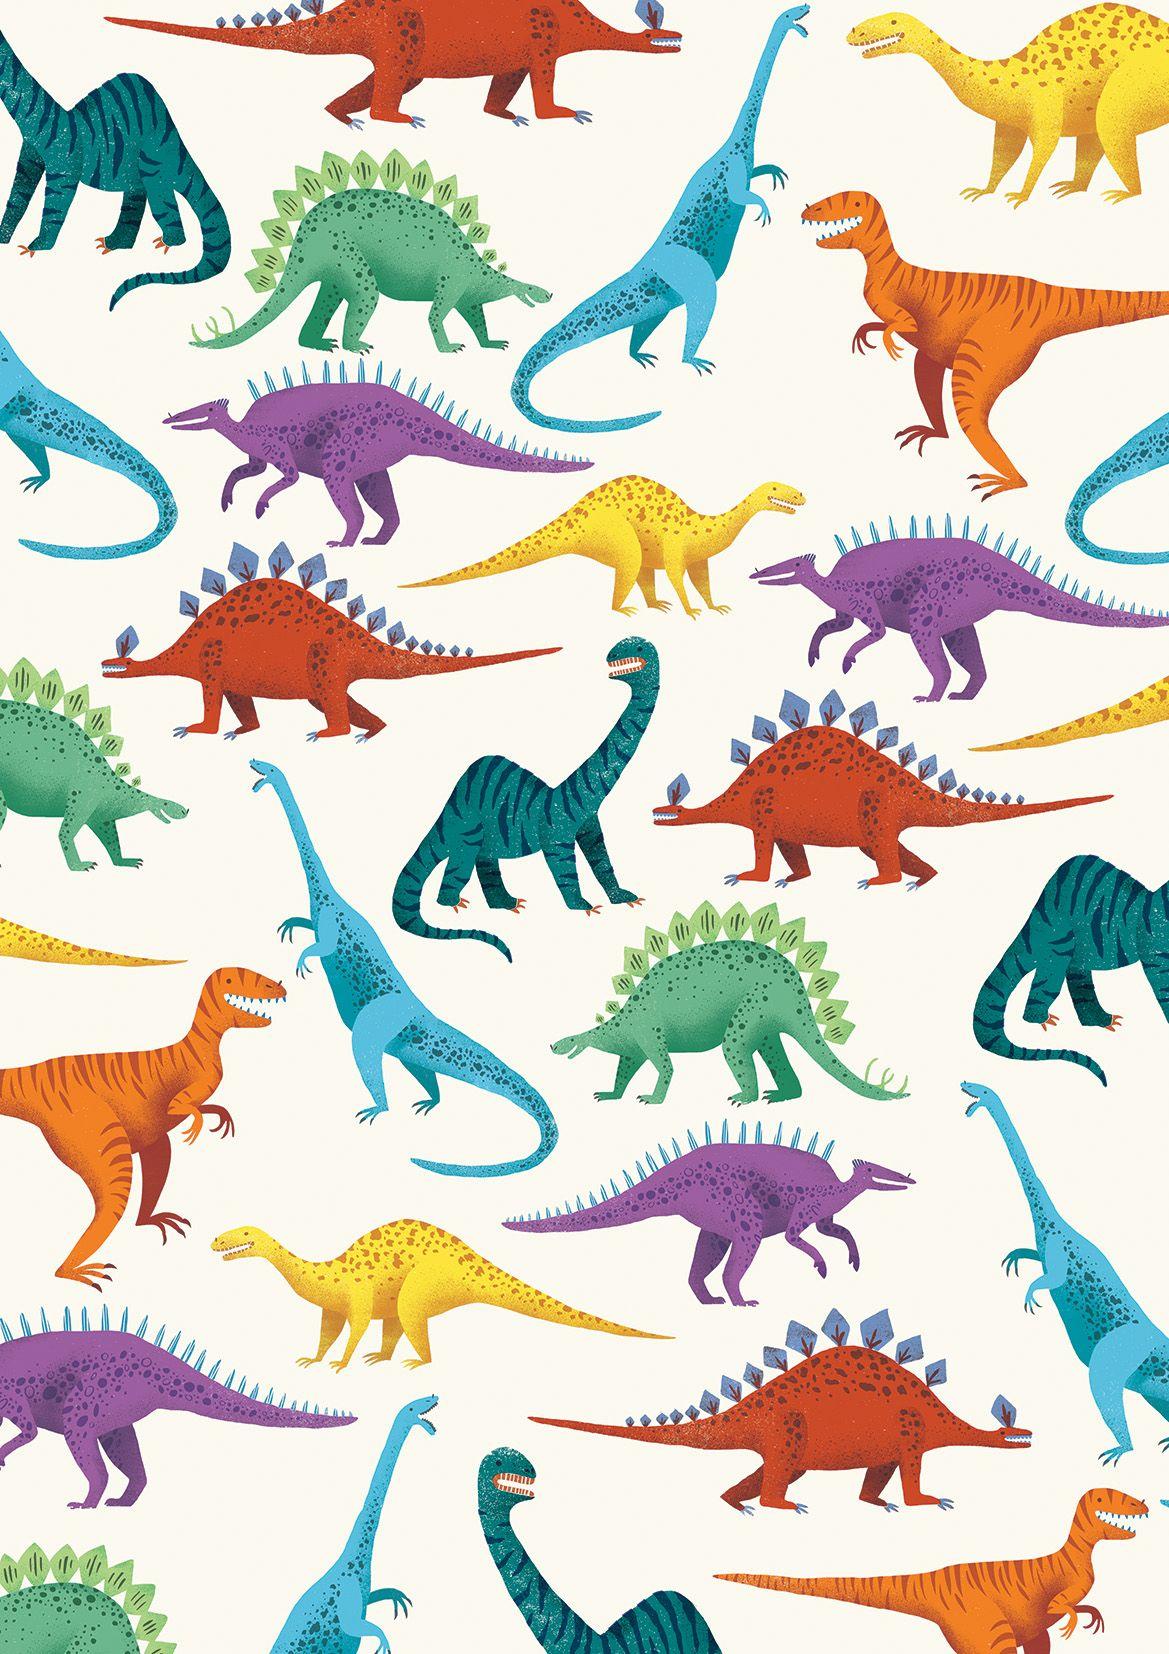 Rachael Saunders Illustration Dinosaurs Patterns